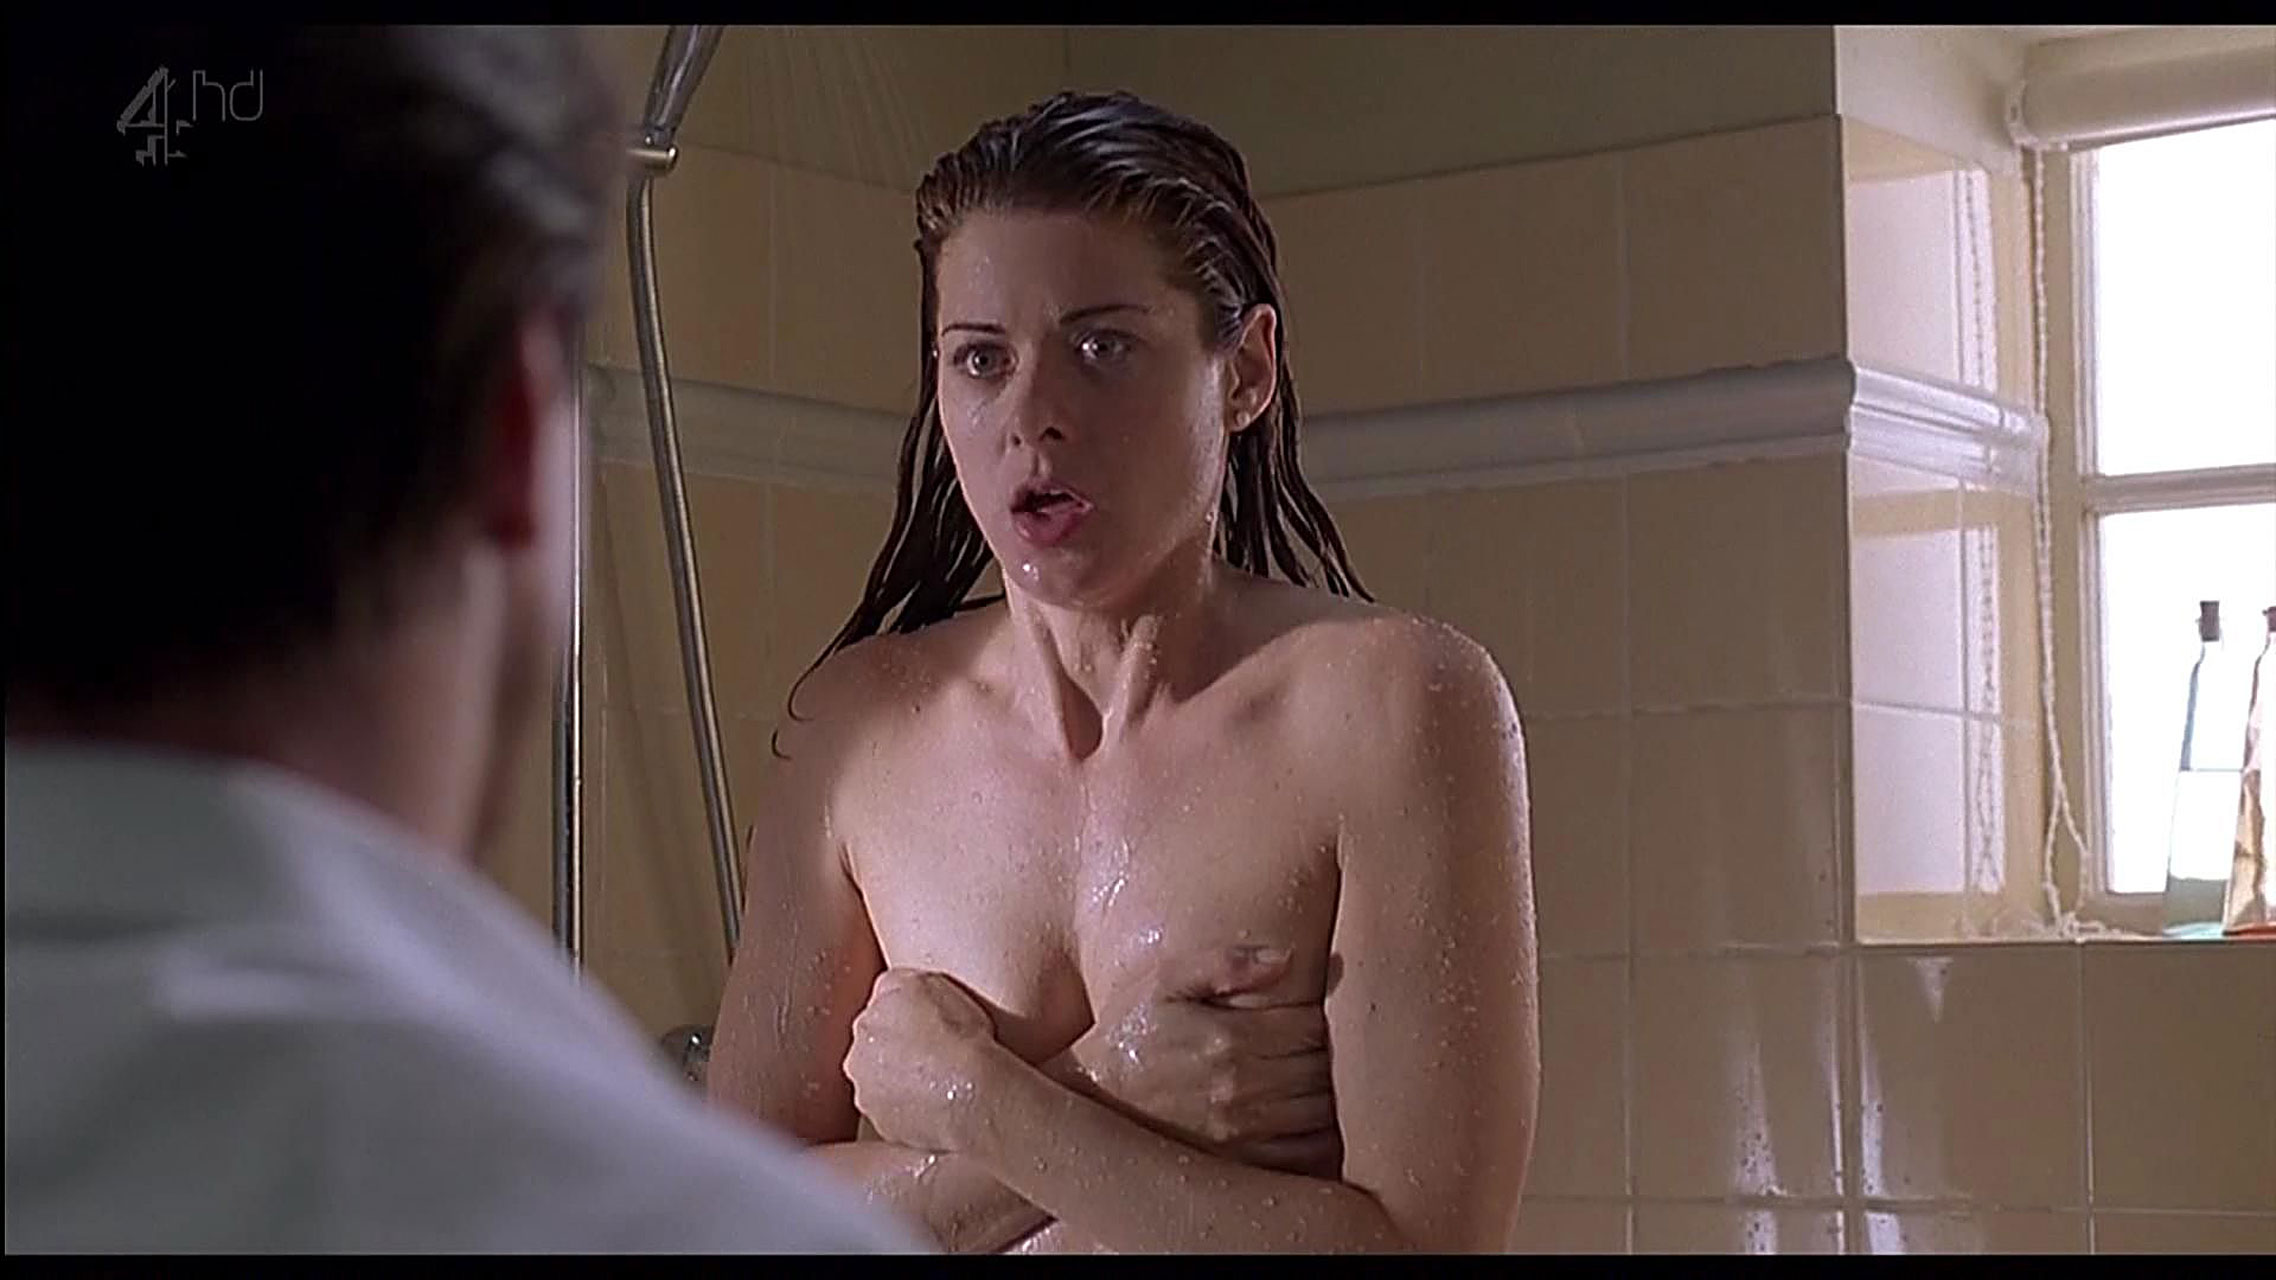 Alyson Hannigan Topless alyson hannigan nude sex tape - megapornx